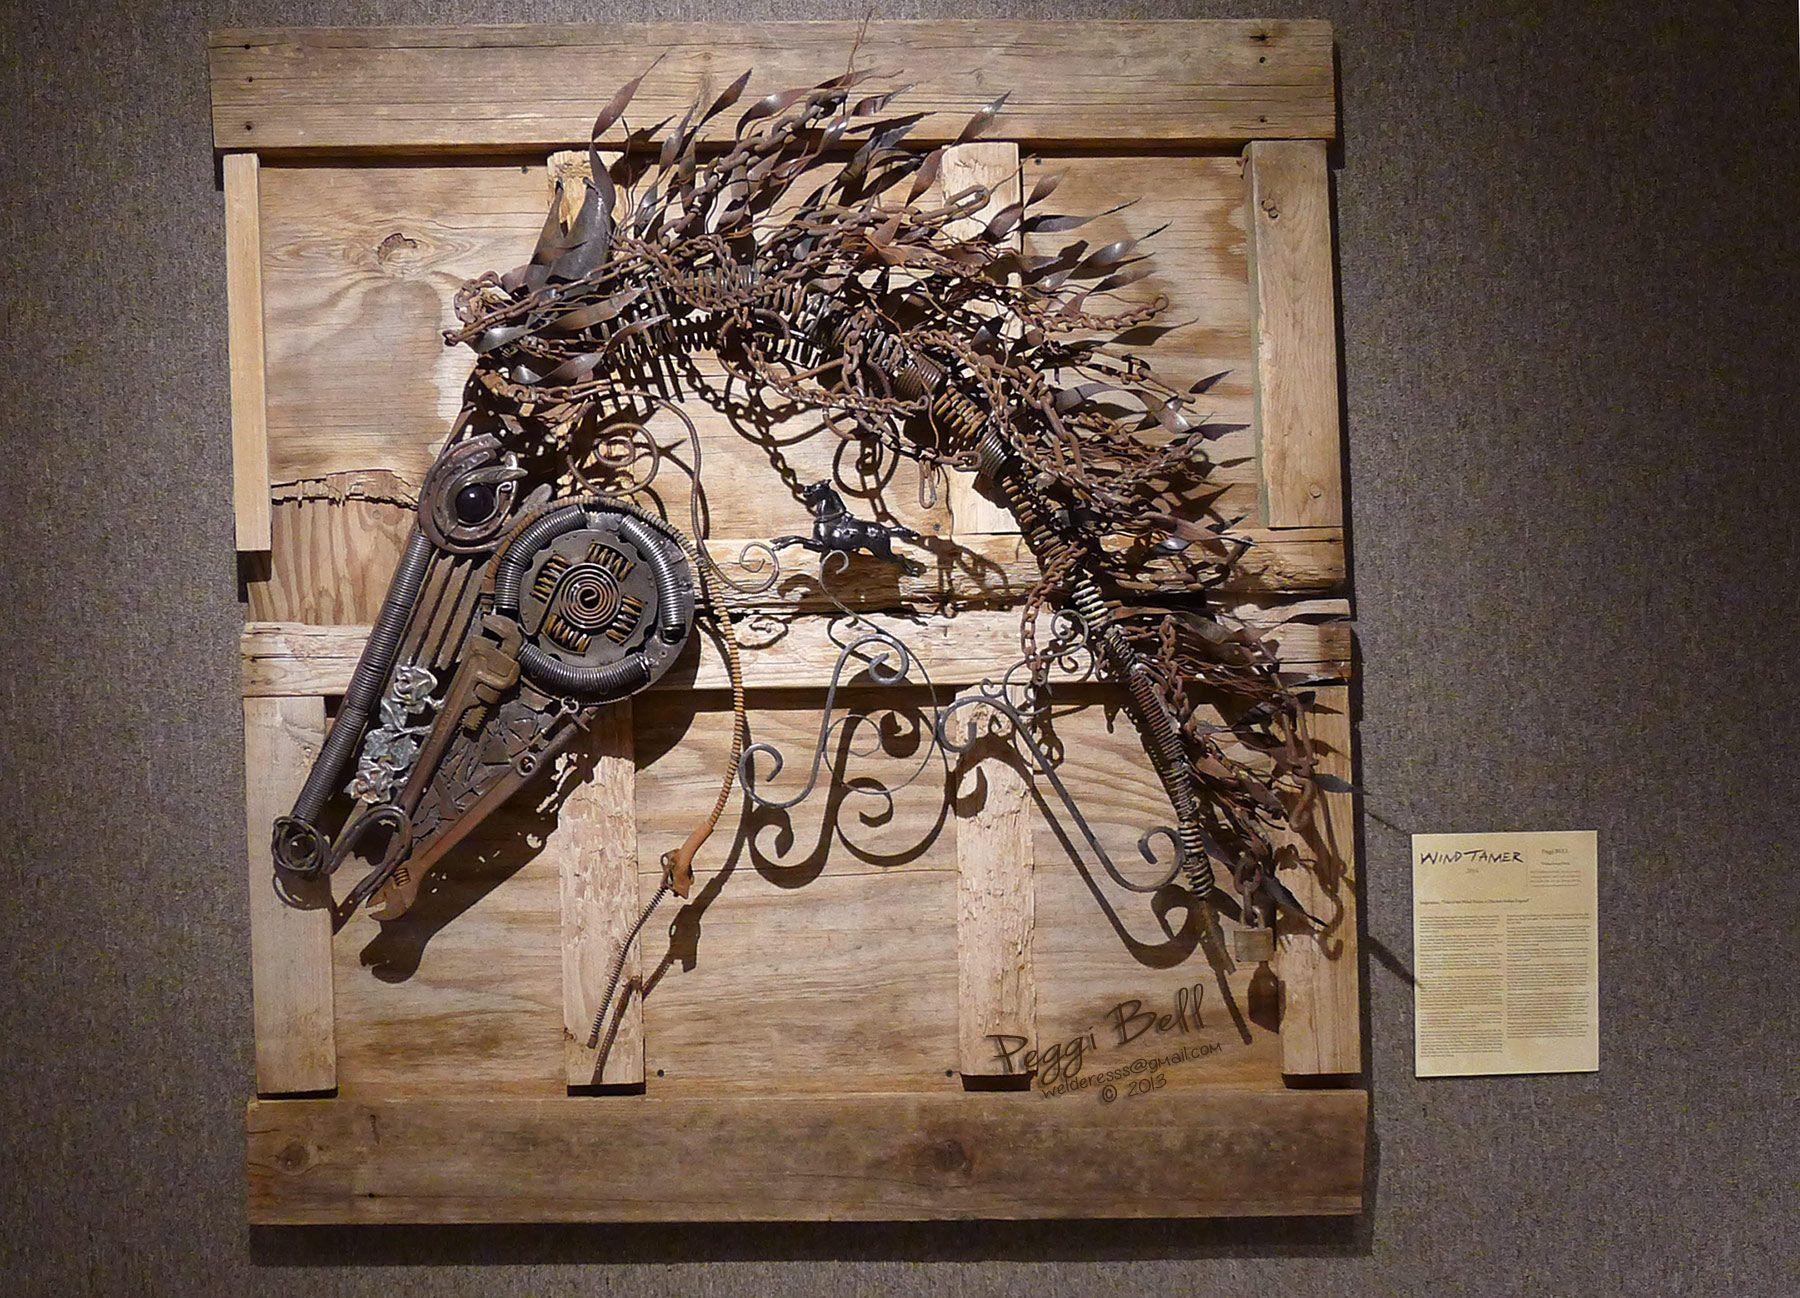 Wind Tamer - Scrap metal horse sculpture -Welded Art by Peggi Bell ...